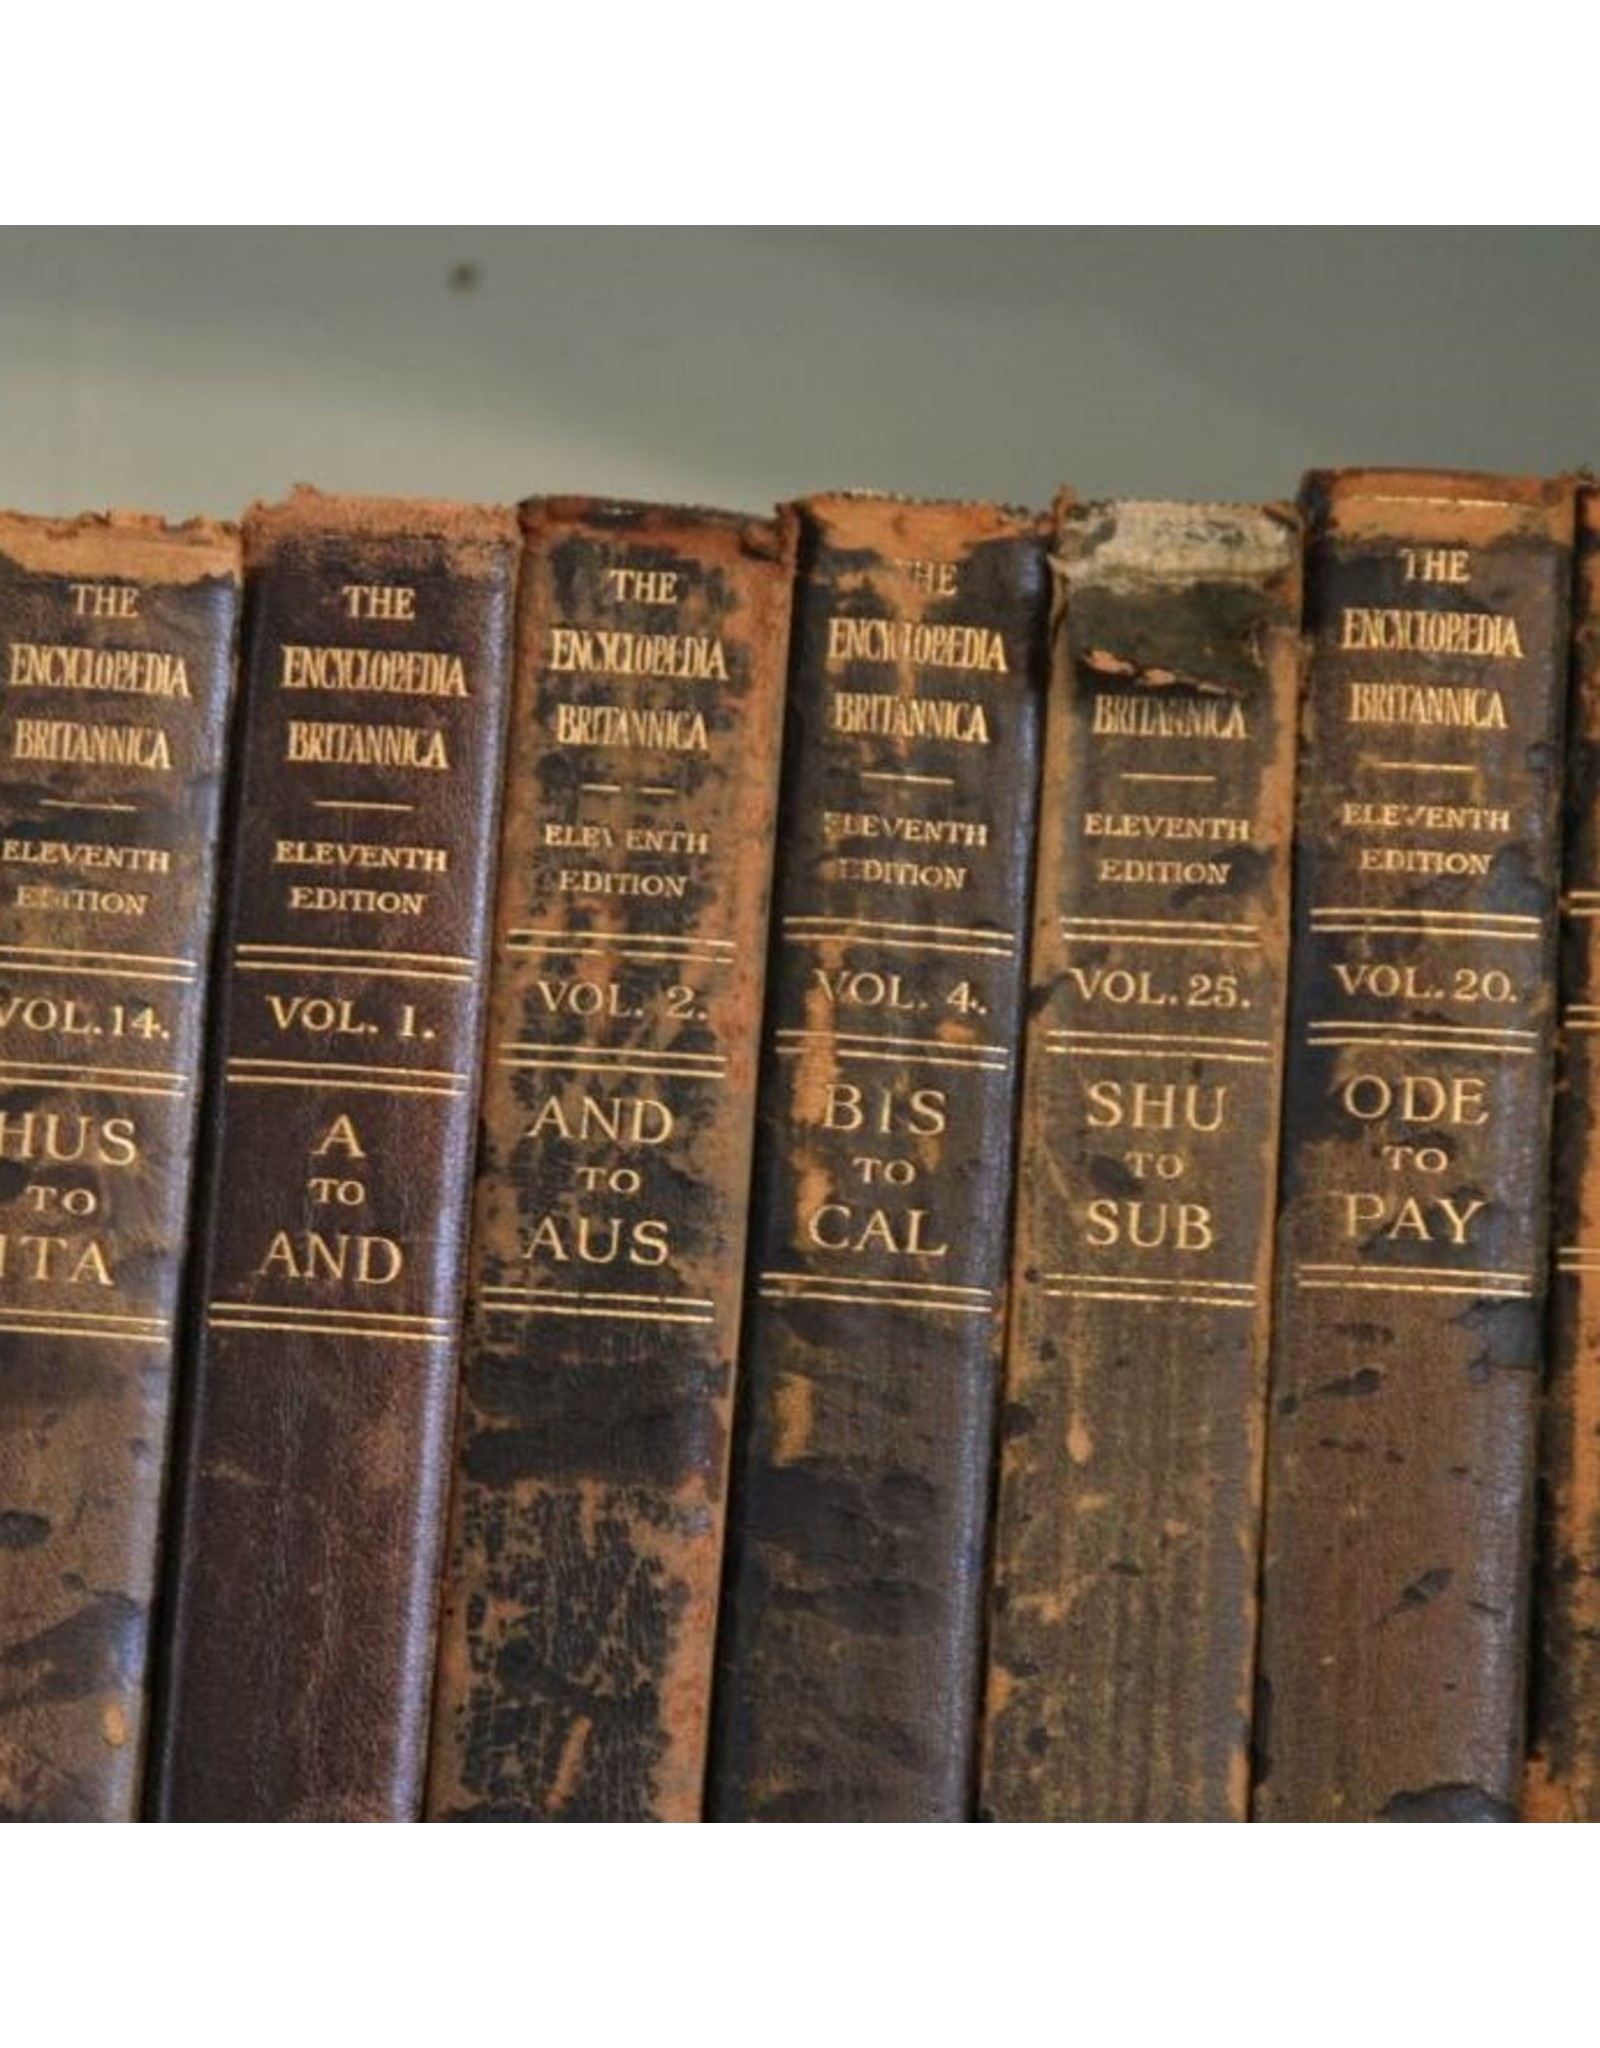 Books - 18 volumes of Encyclopedia Britannica 1911, 11th edition